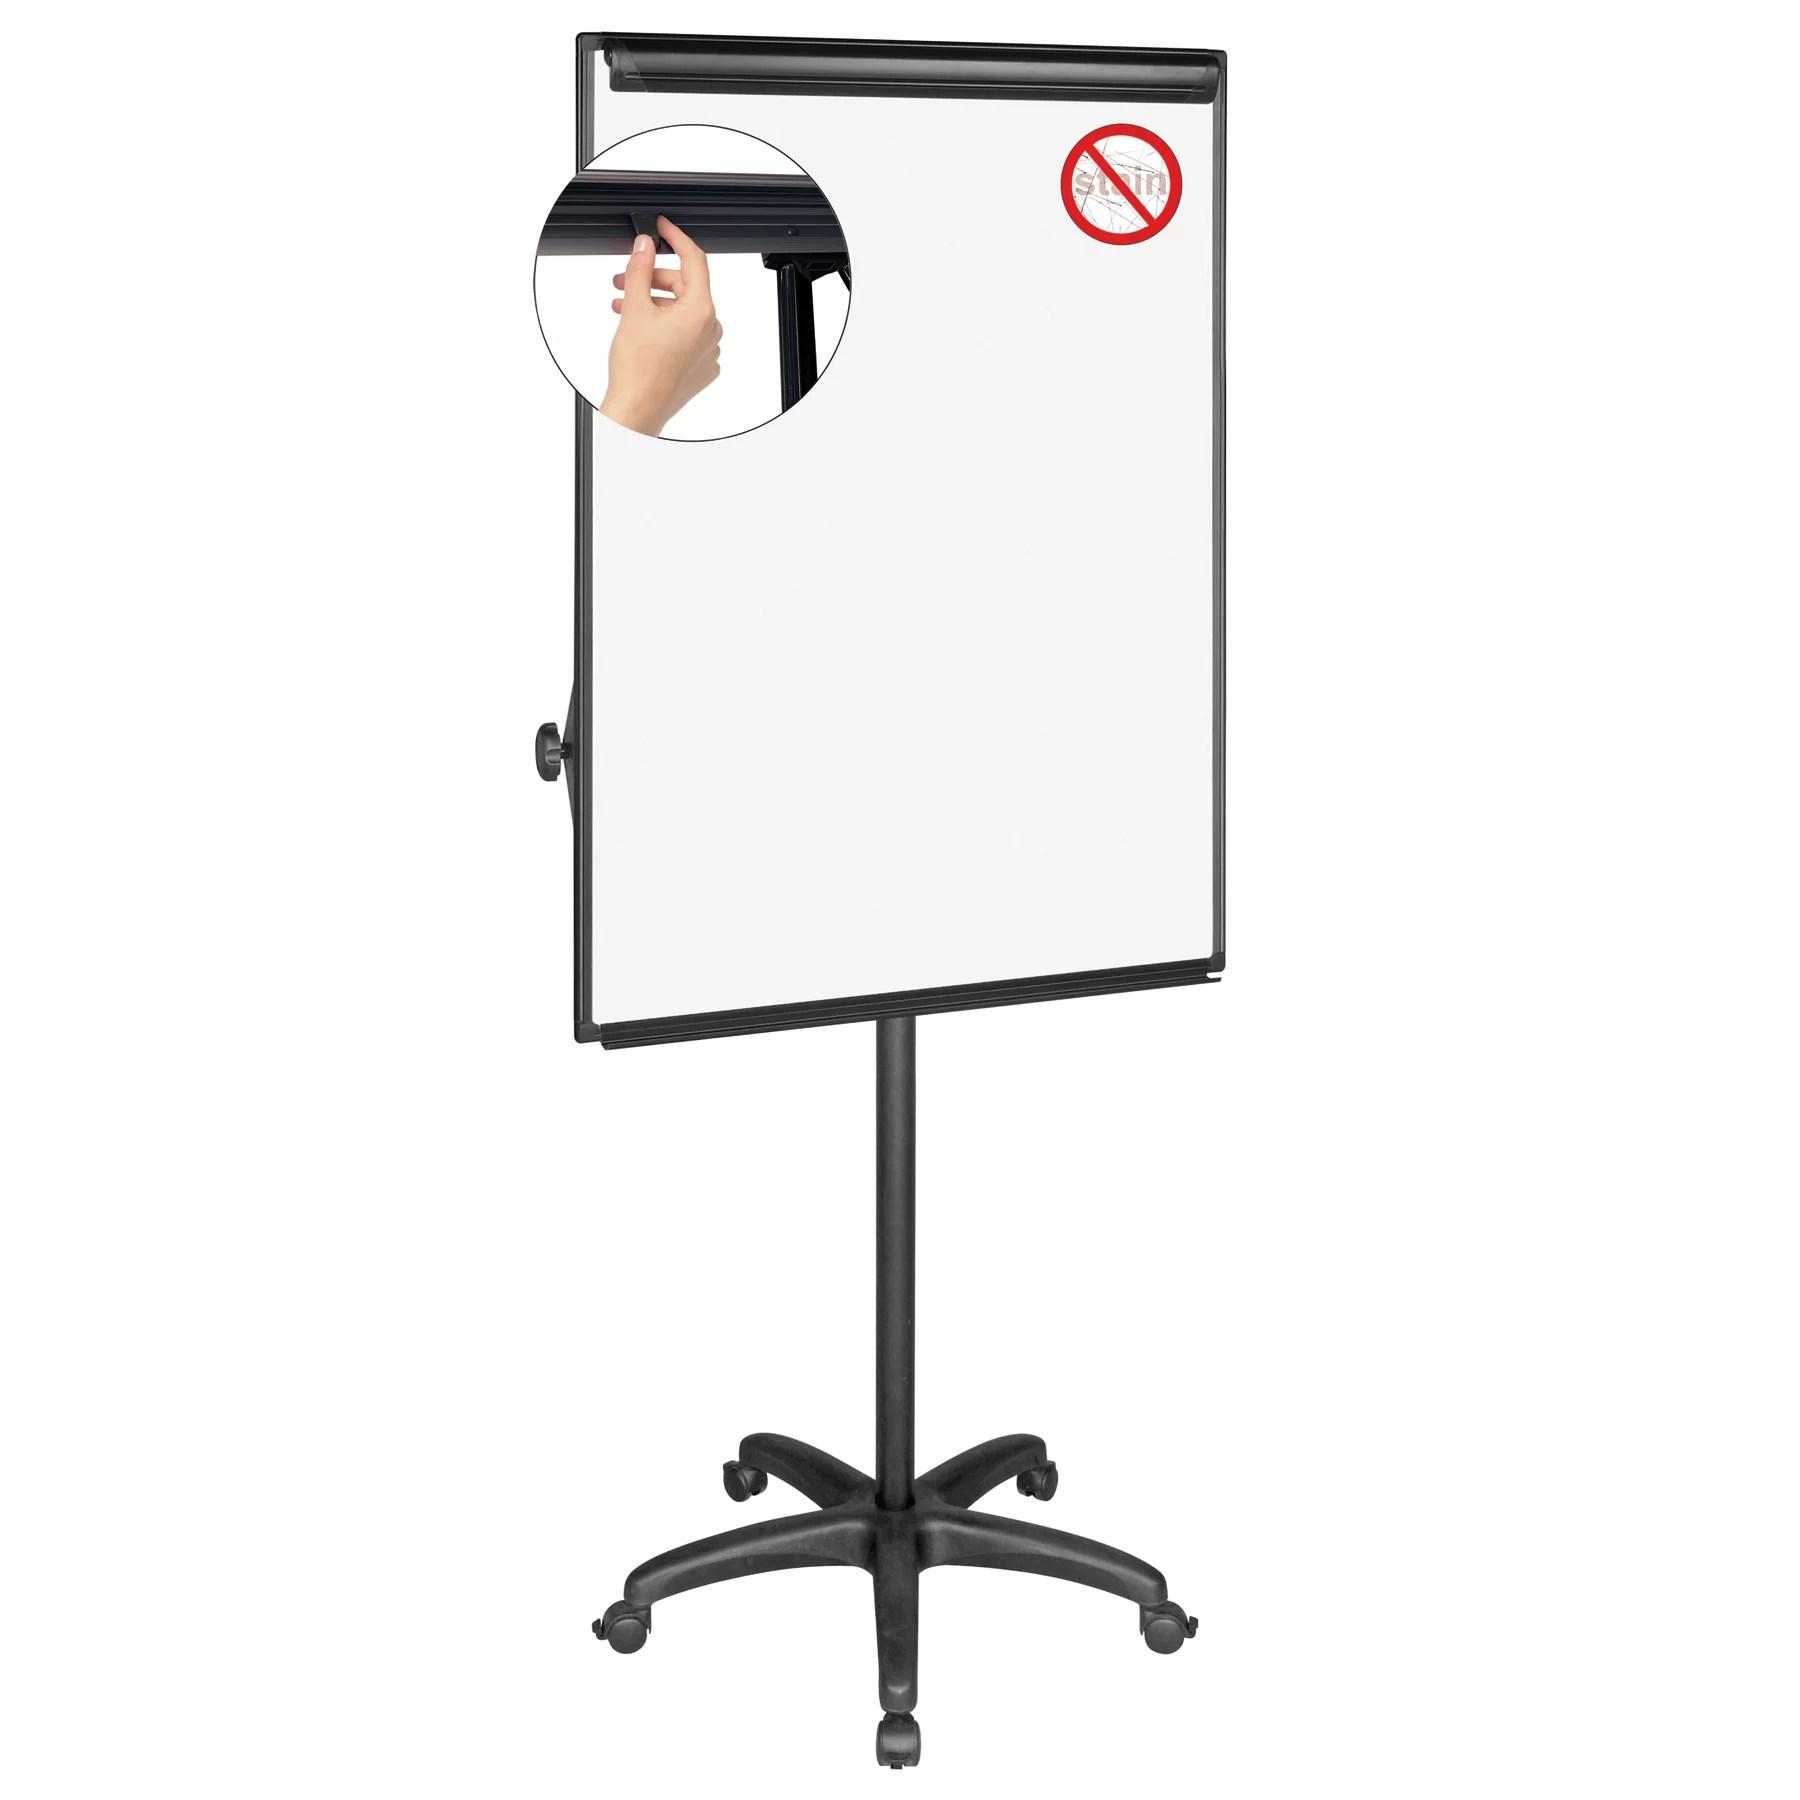 Mastervision Dry Erase Mobile Presentation Easel 6' H x 3